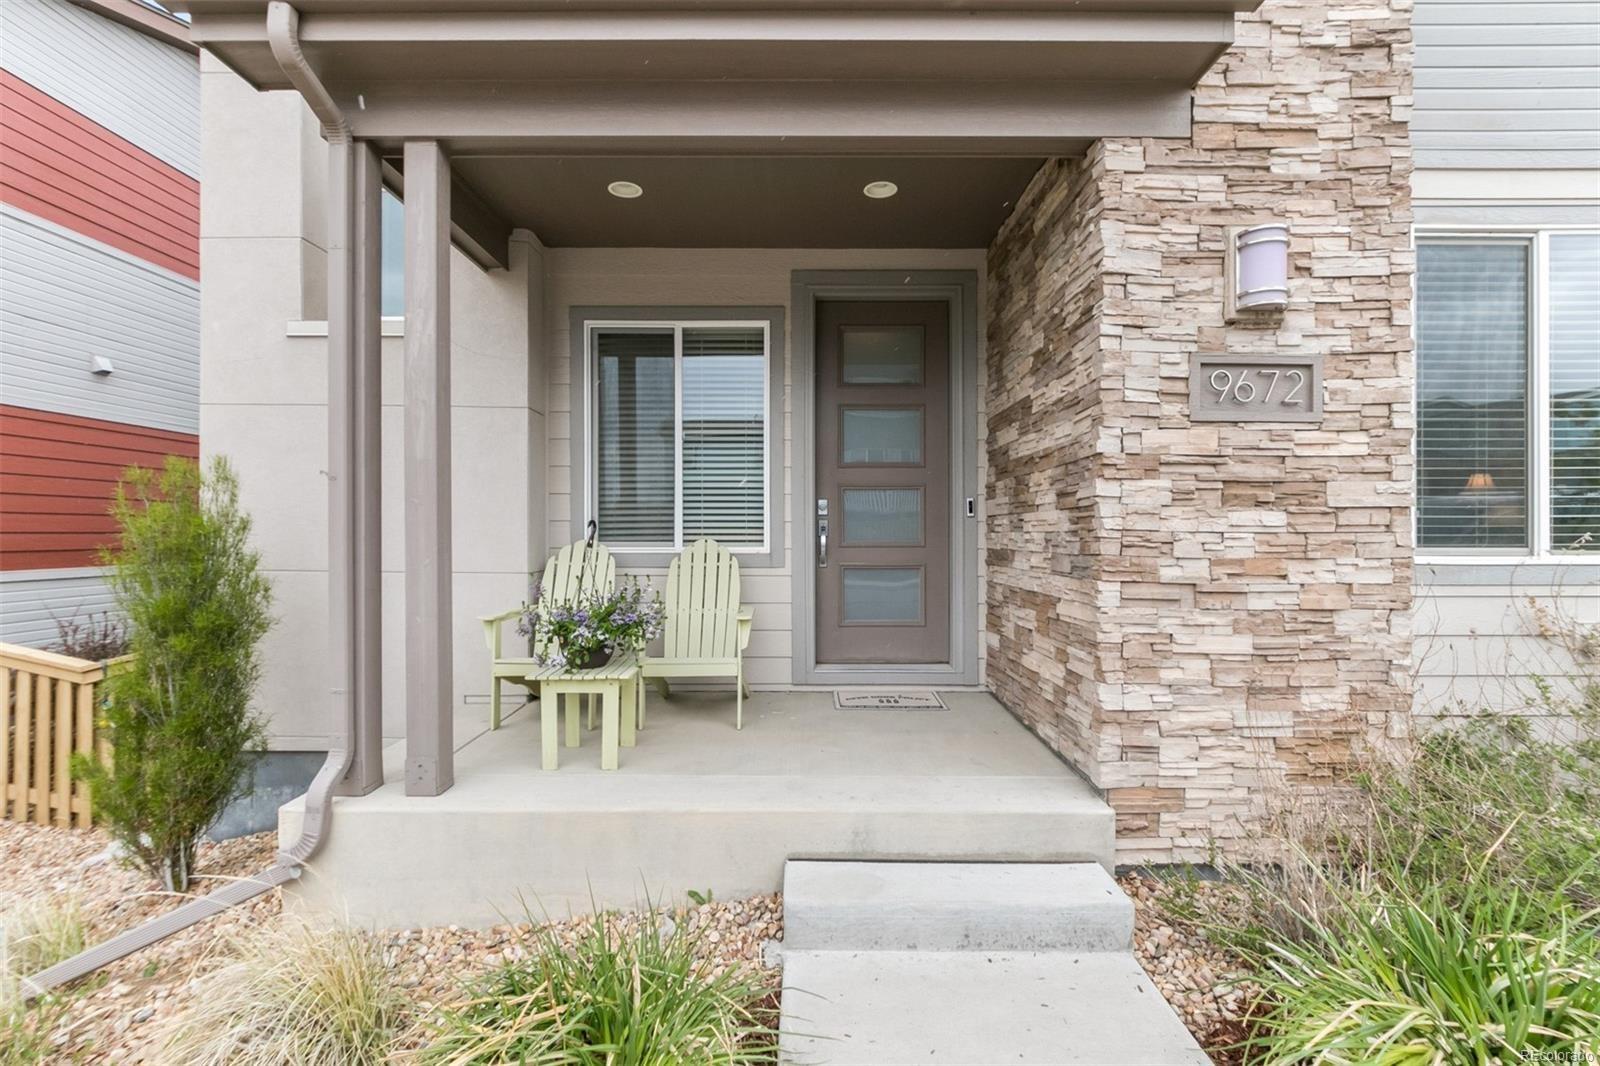 MLS# 5189285 - 1 - 9672  Dunning Circle, Highlands Ranch, CO 80126